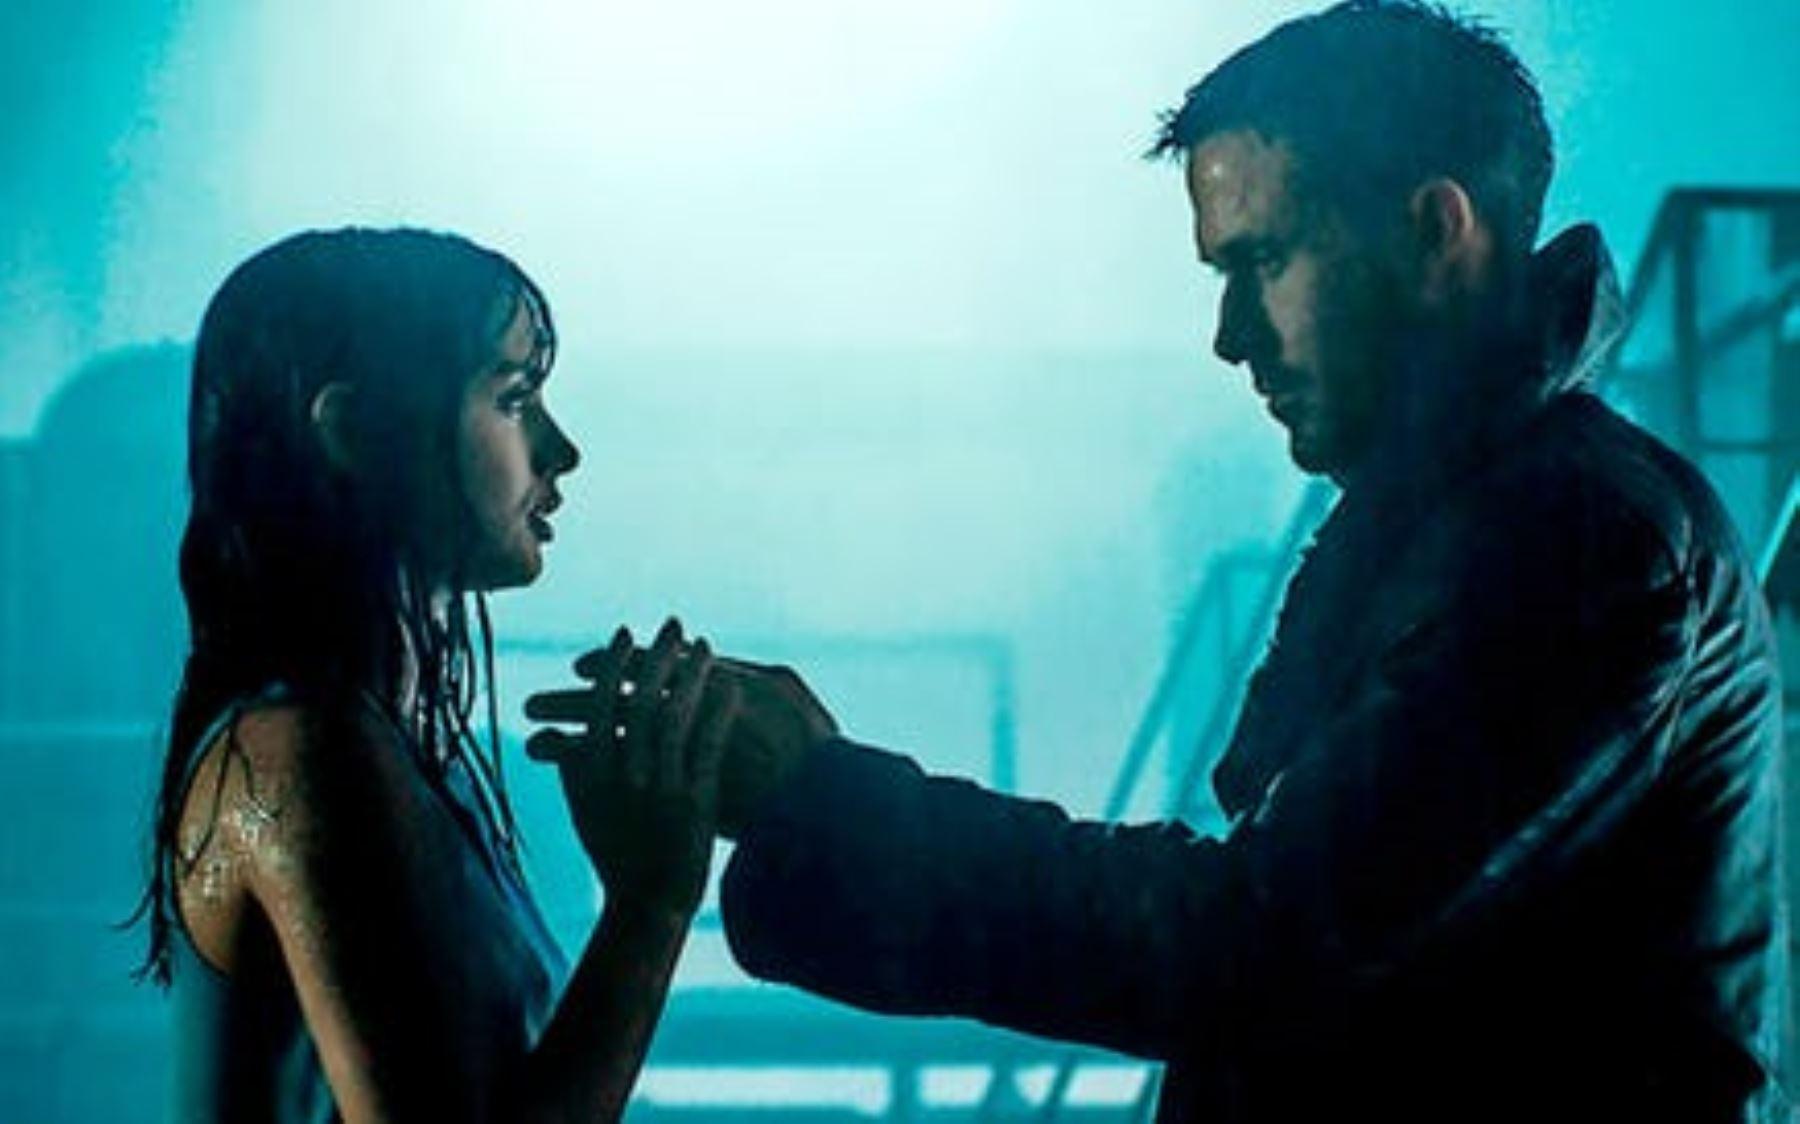 Escena de Blade Runner 2049